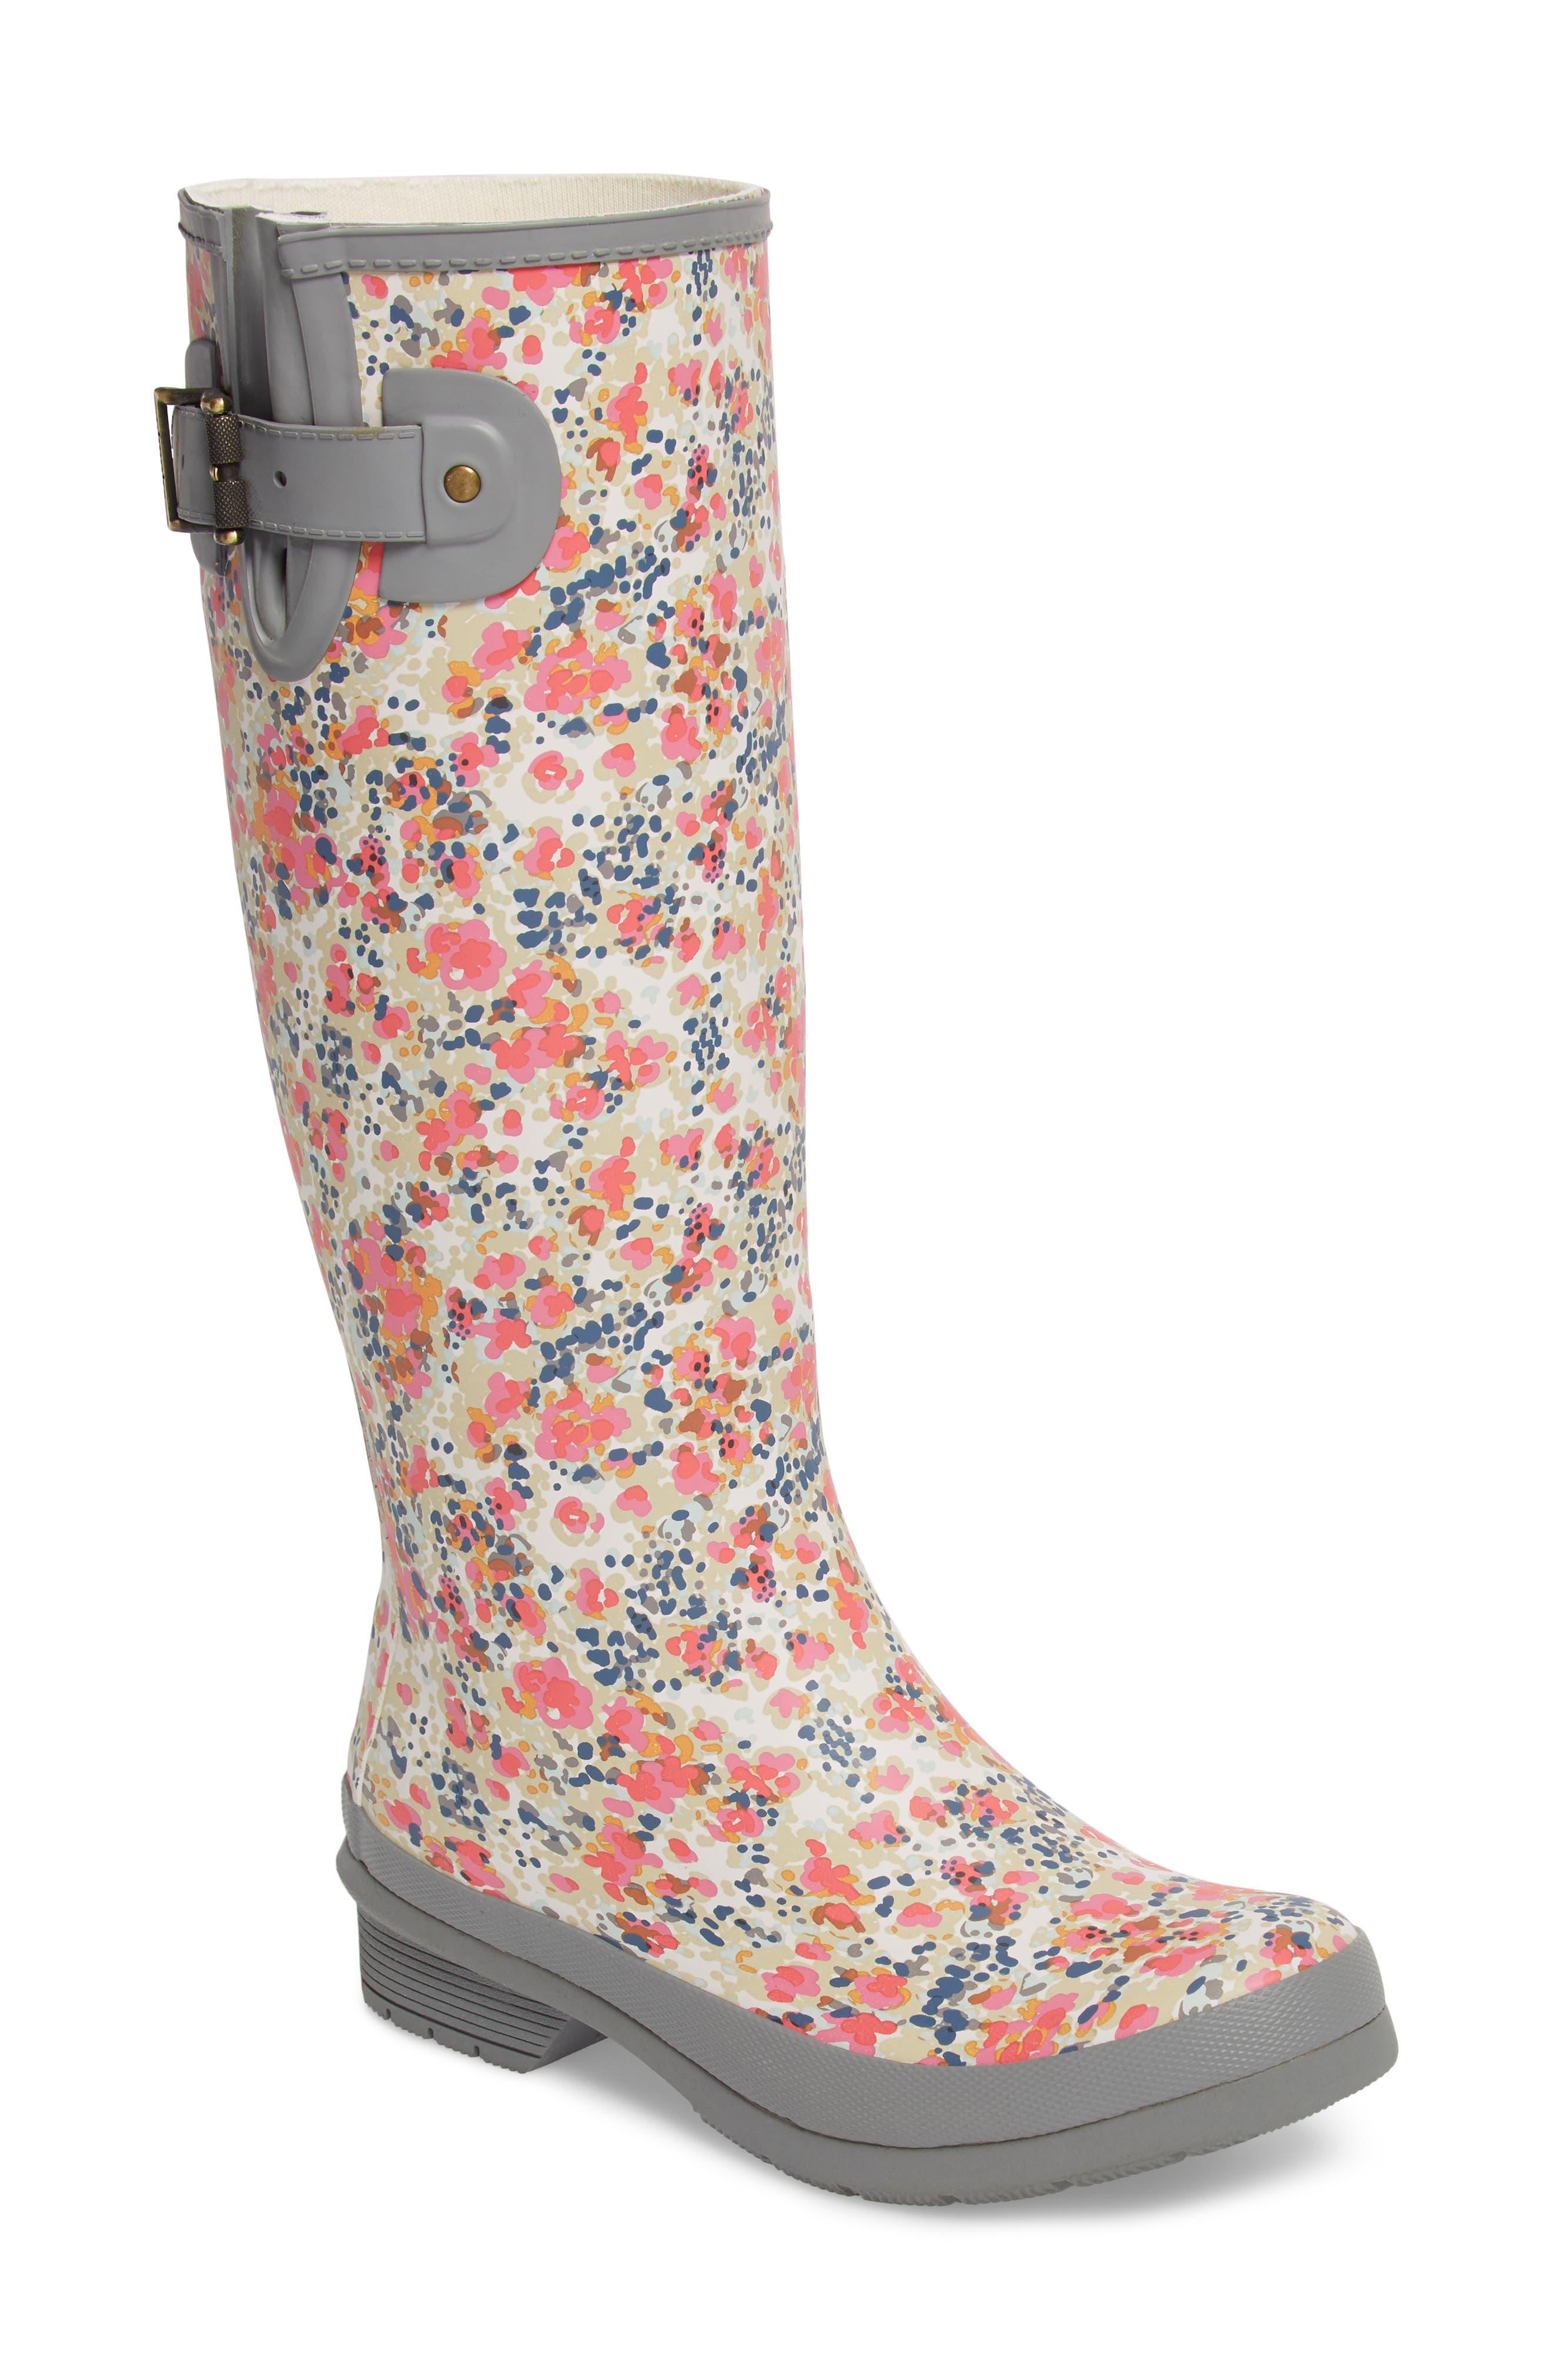 Chooka Julia Floral Waterproof Rain Boot, Grey